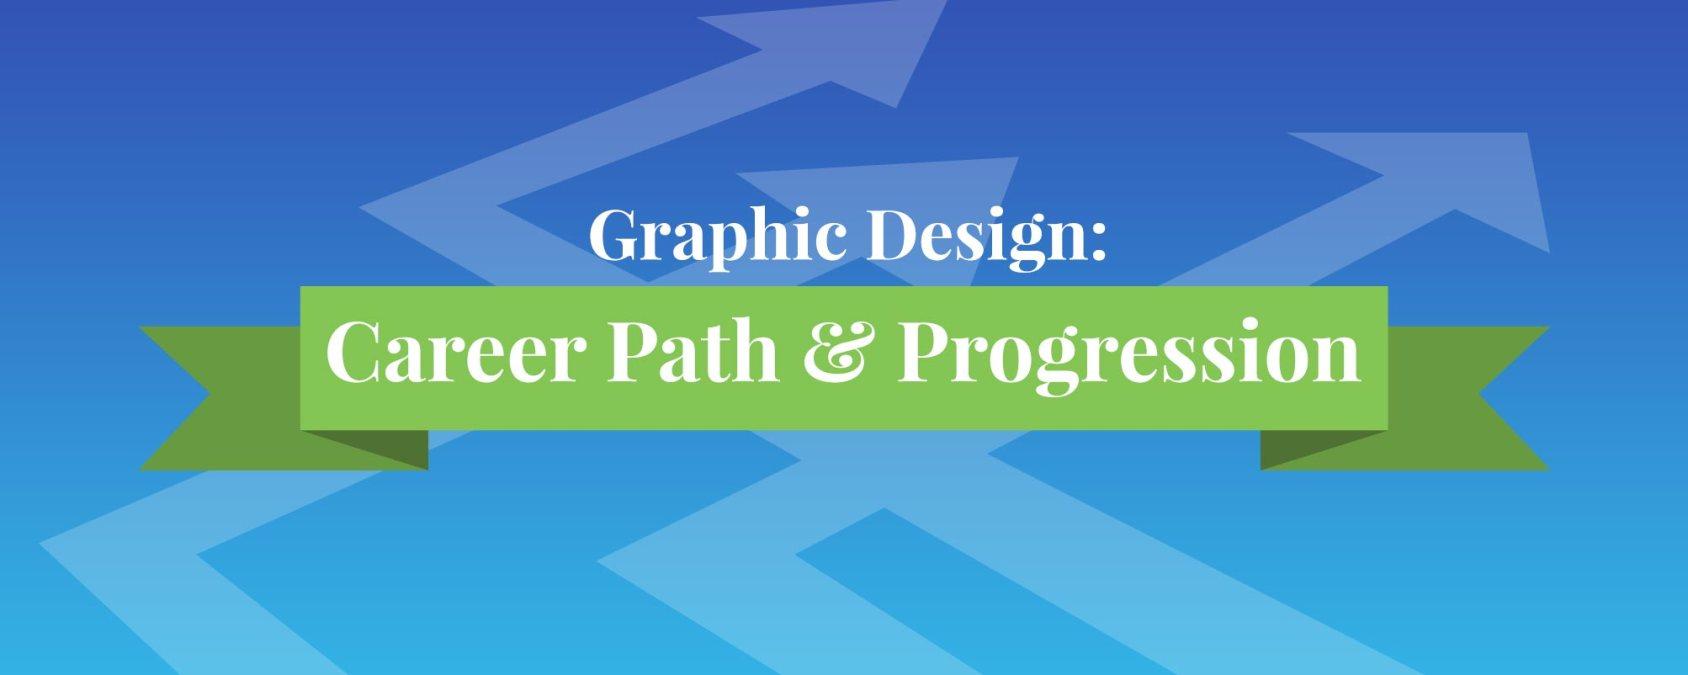 Graphic Design Career Path and Progression